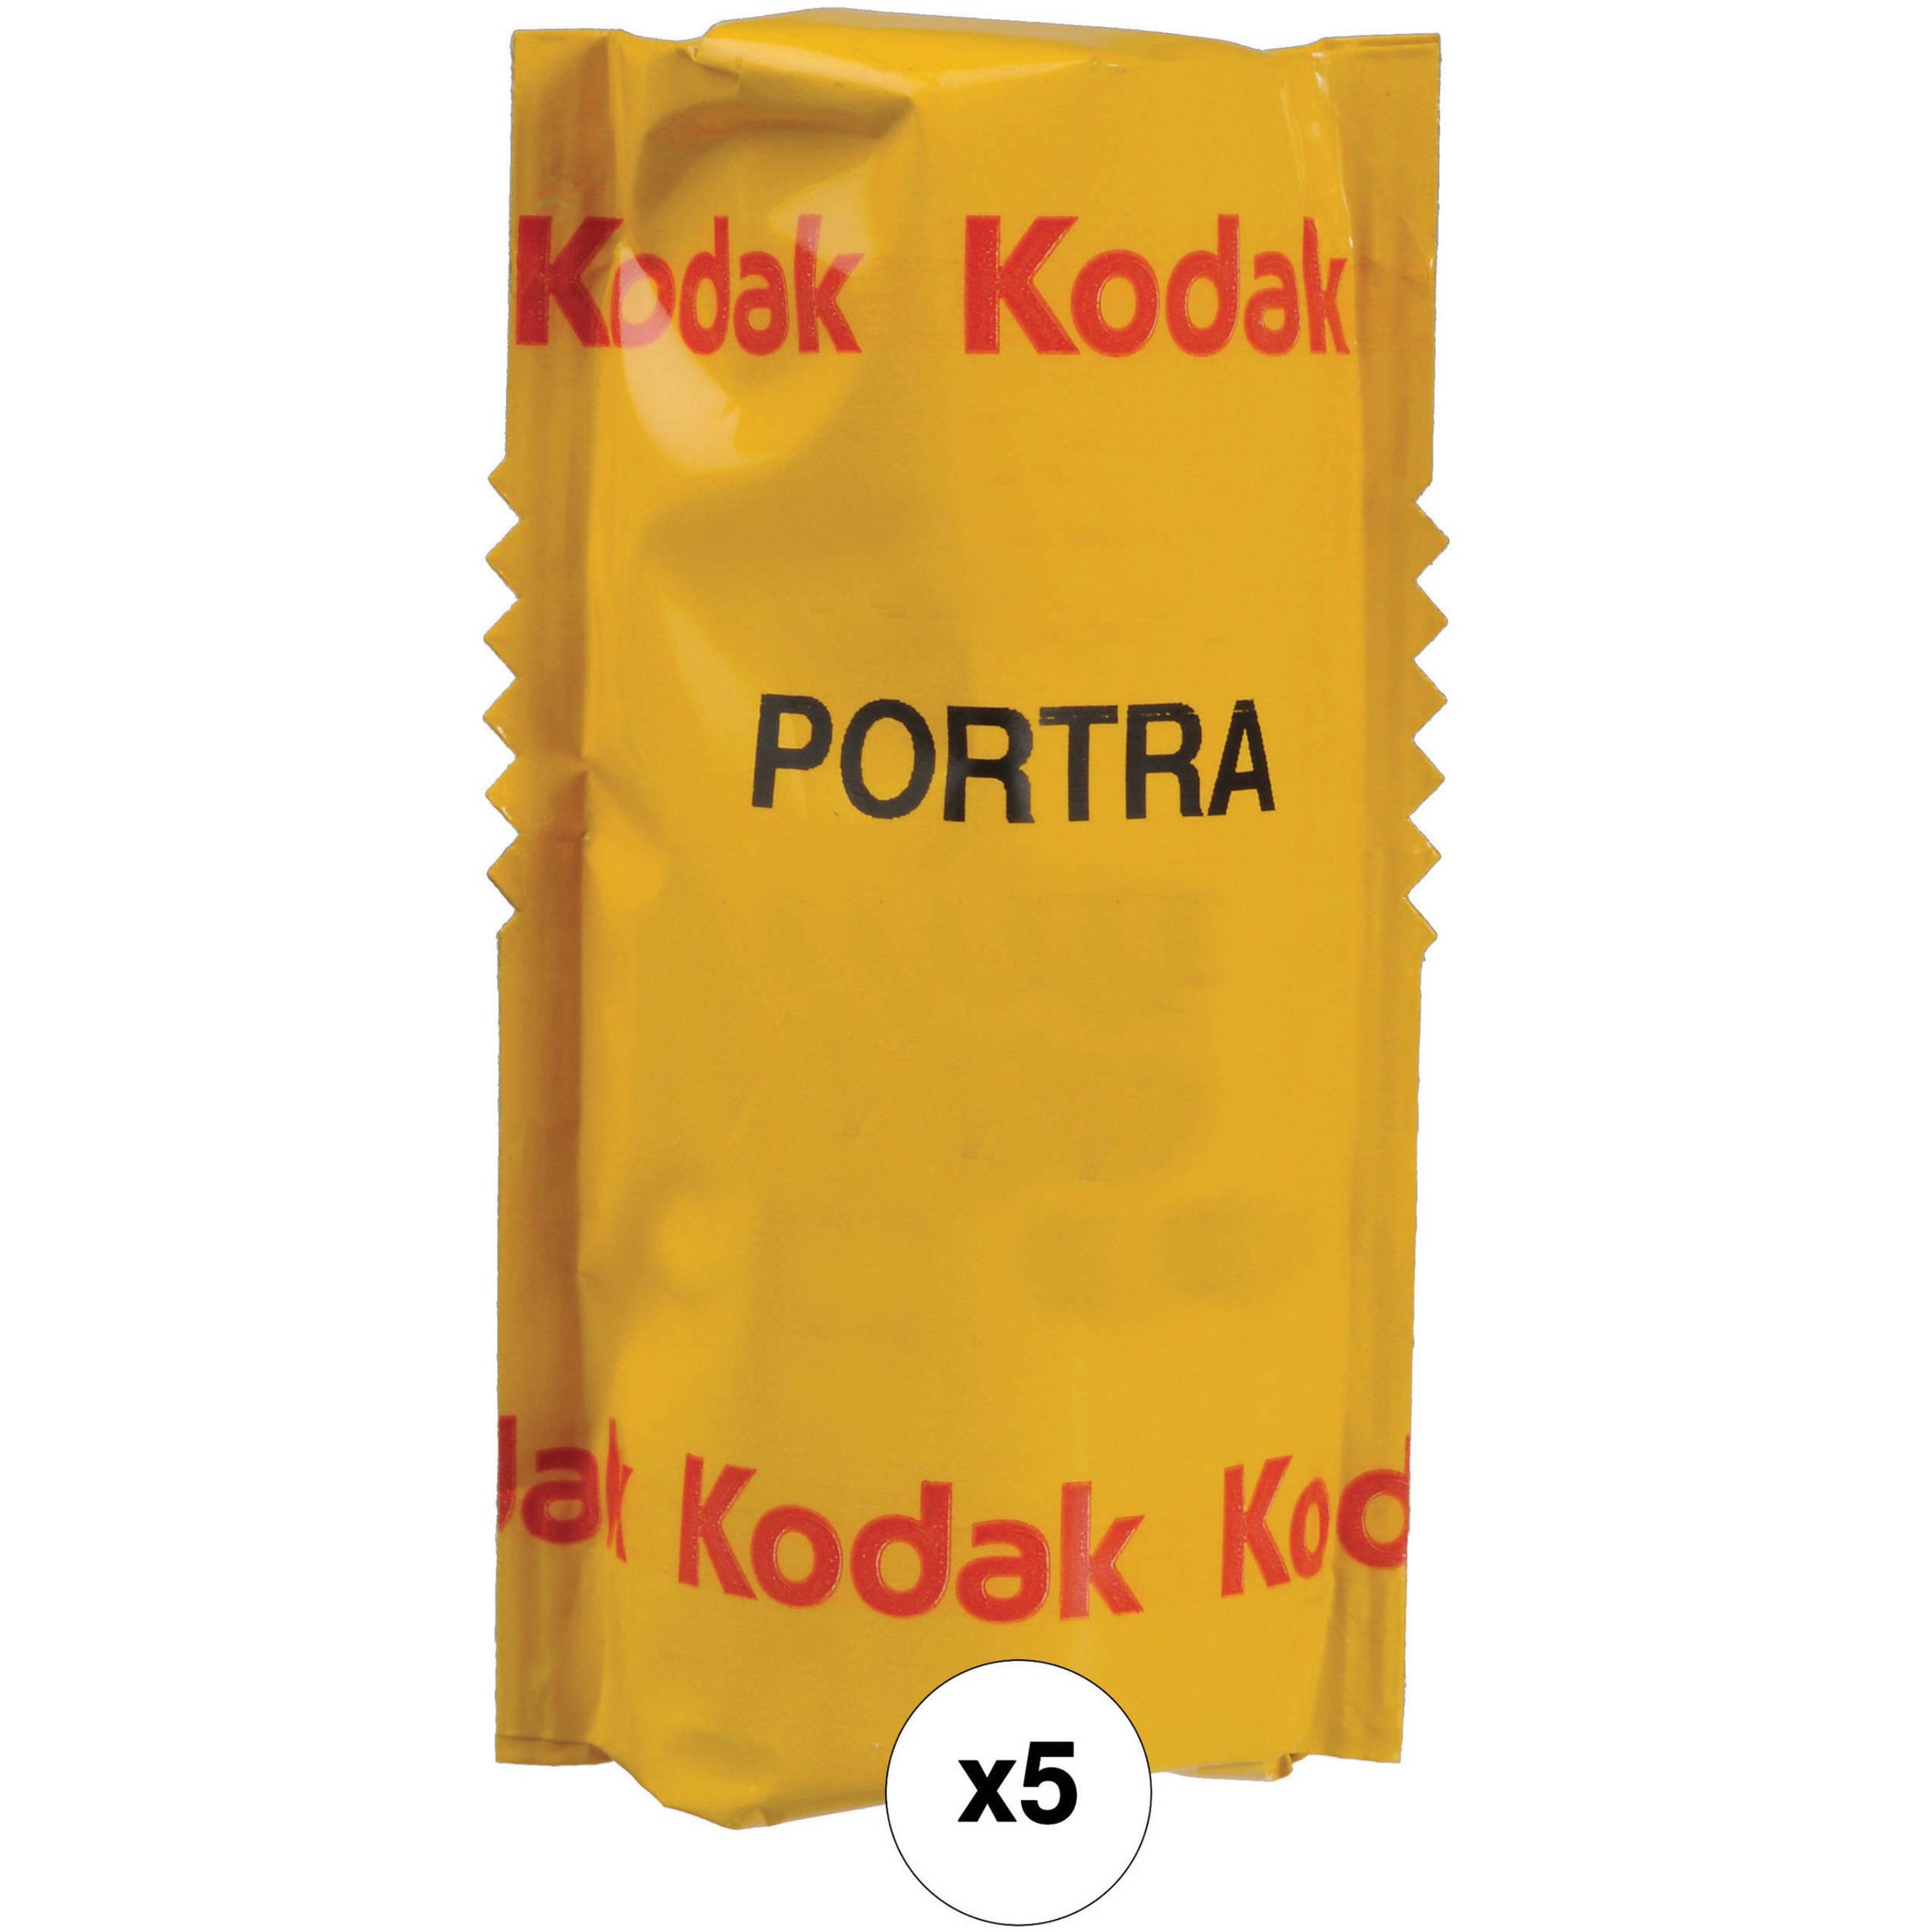 Kodak Professional Portra 160 Color Negative Film 120 Roll 5 Pack